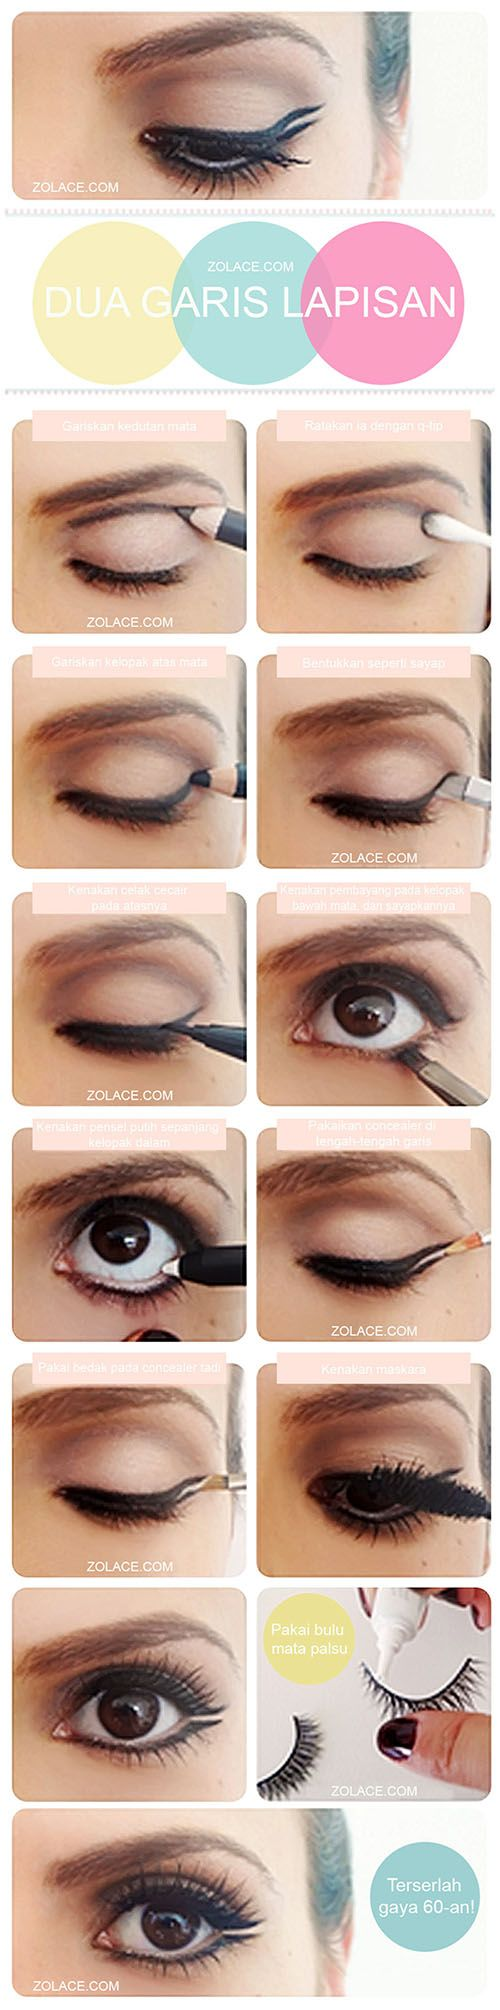 Langkah-langkah Menghasilkan #Makeup #Mata Gaya 60an!